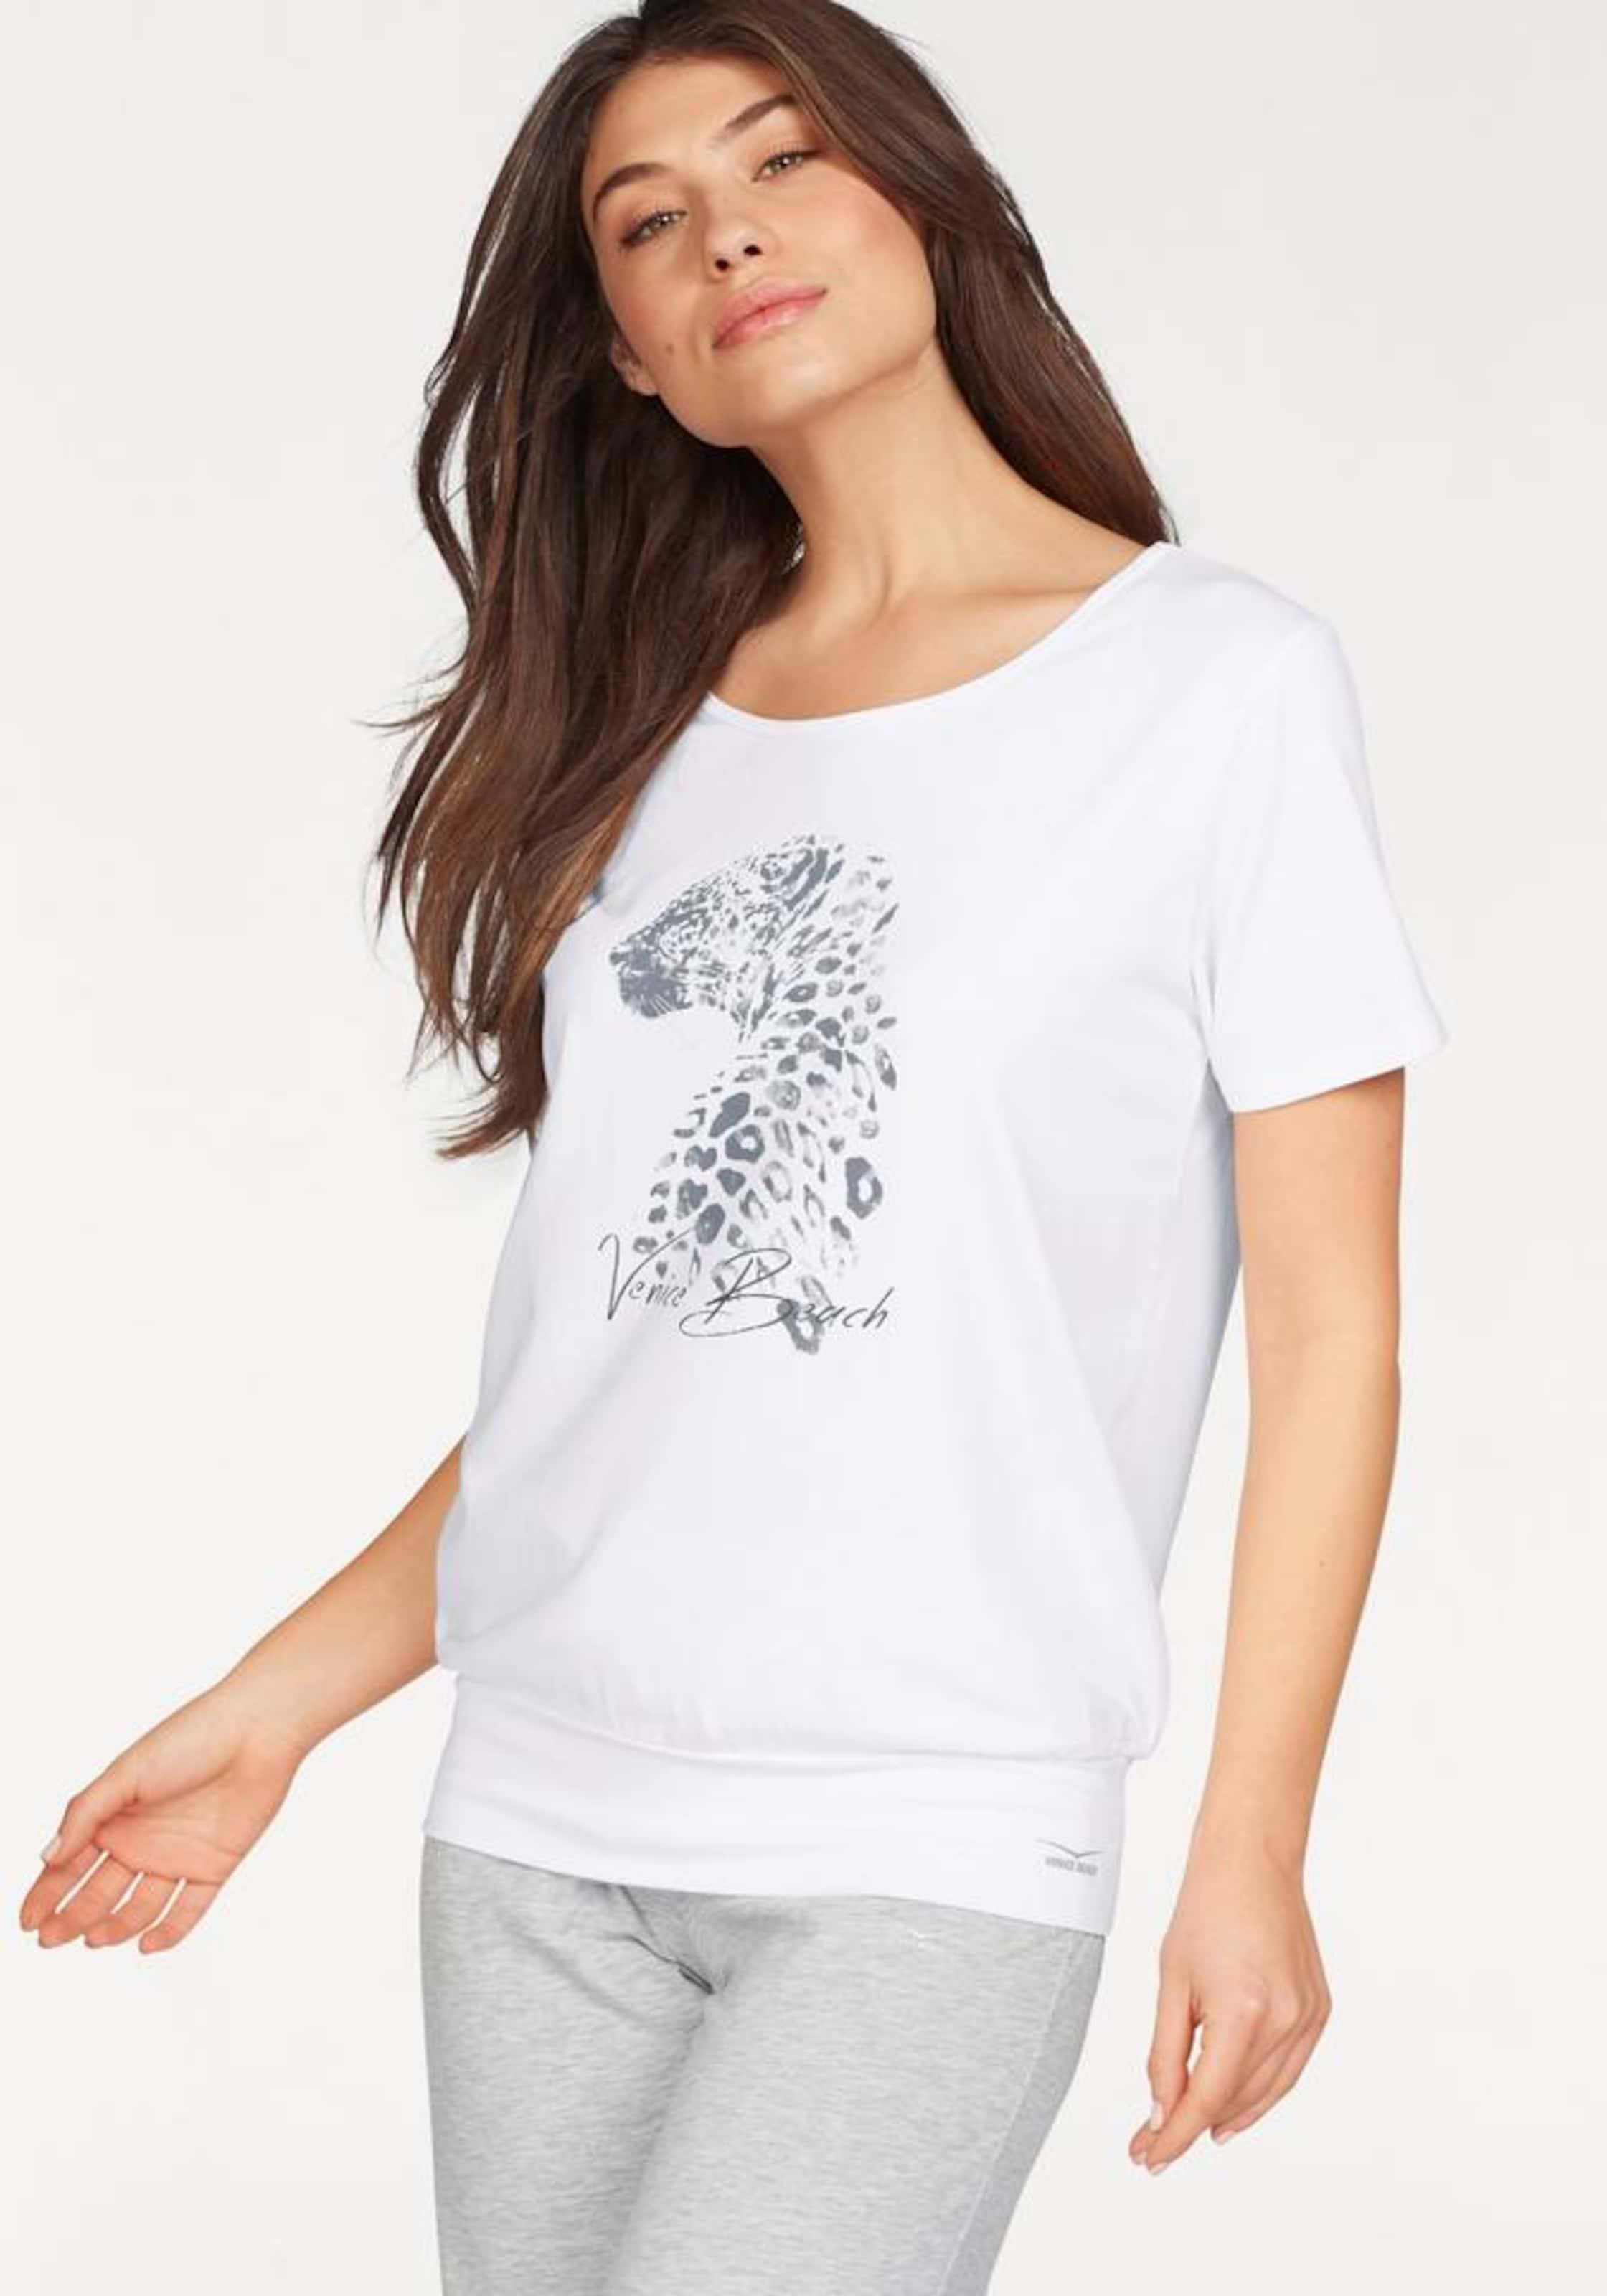 In 'rita' shirt Weiß Venice Beach T D9WH2IE